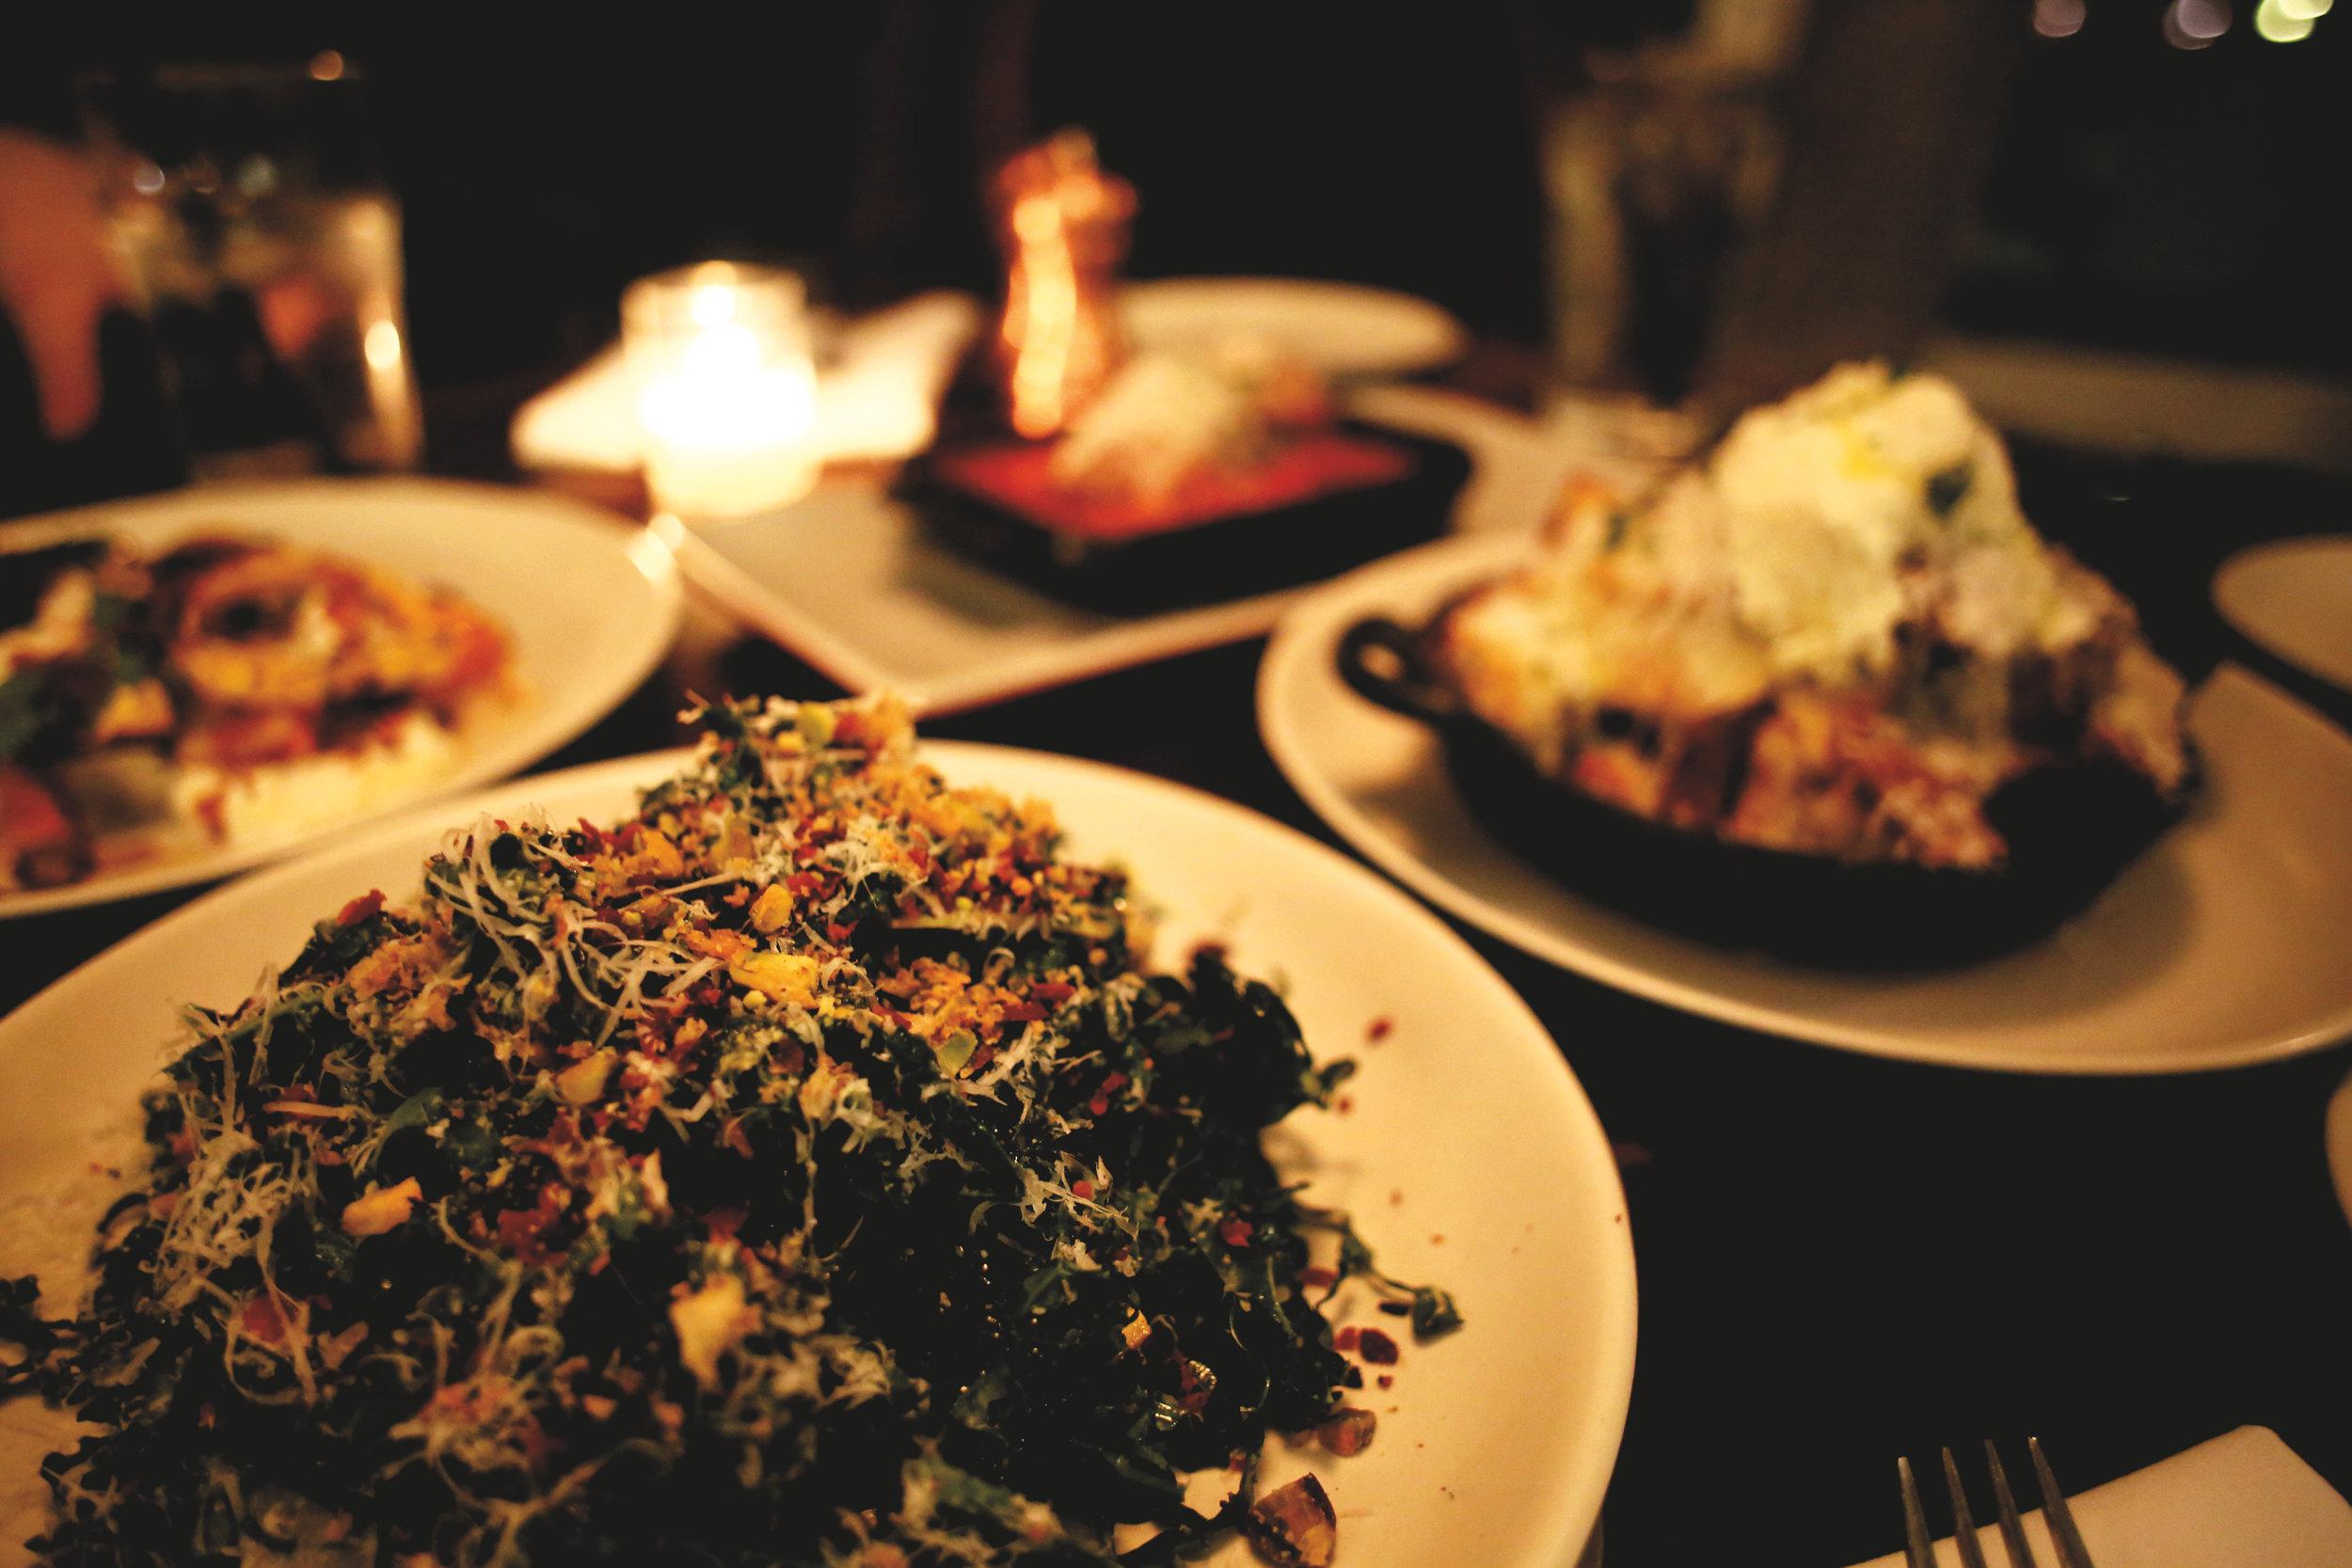 Tuscan Kale Salad & White Truffle Garlic Bread